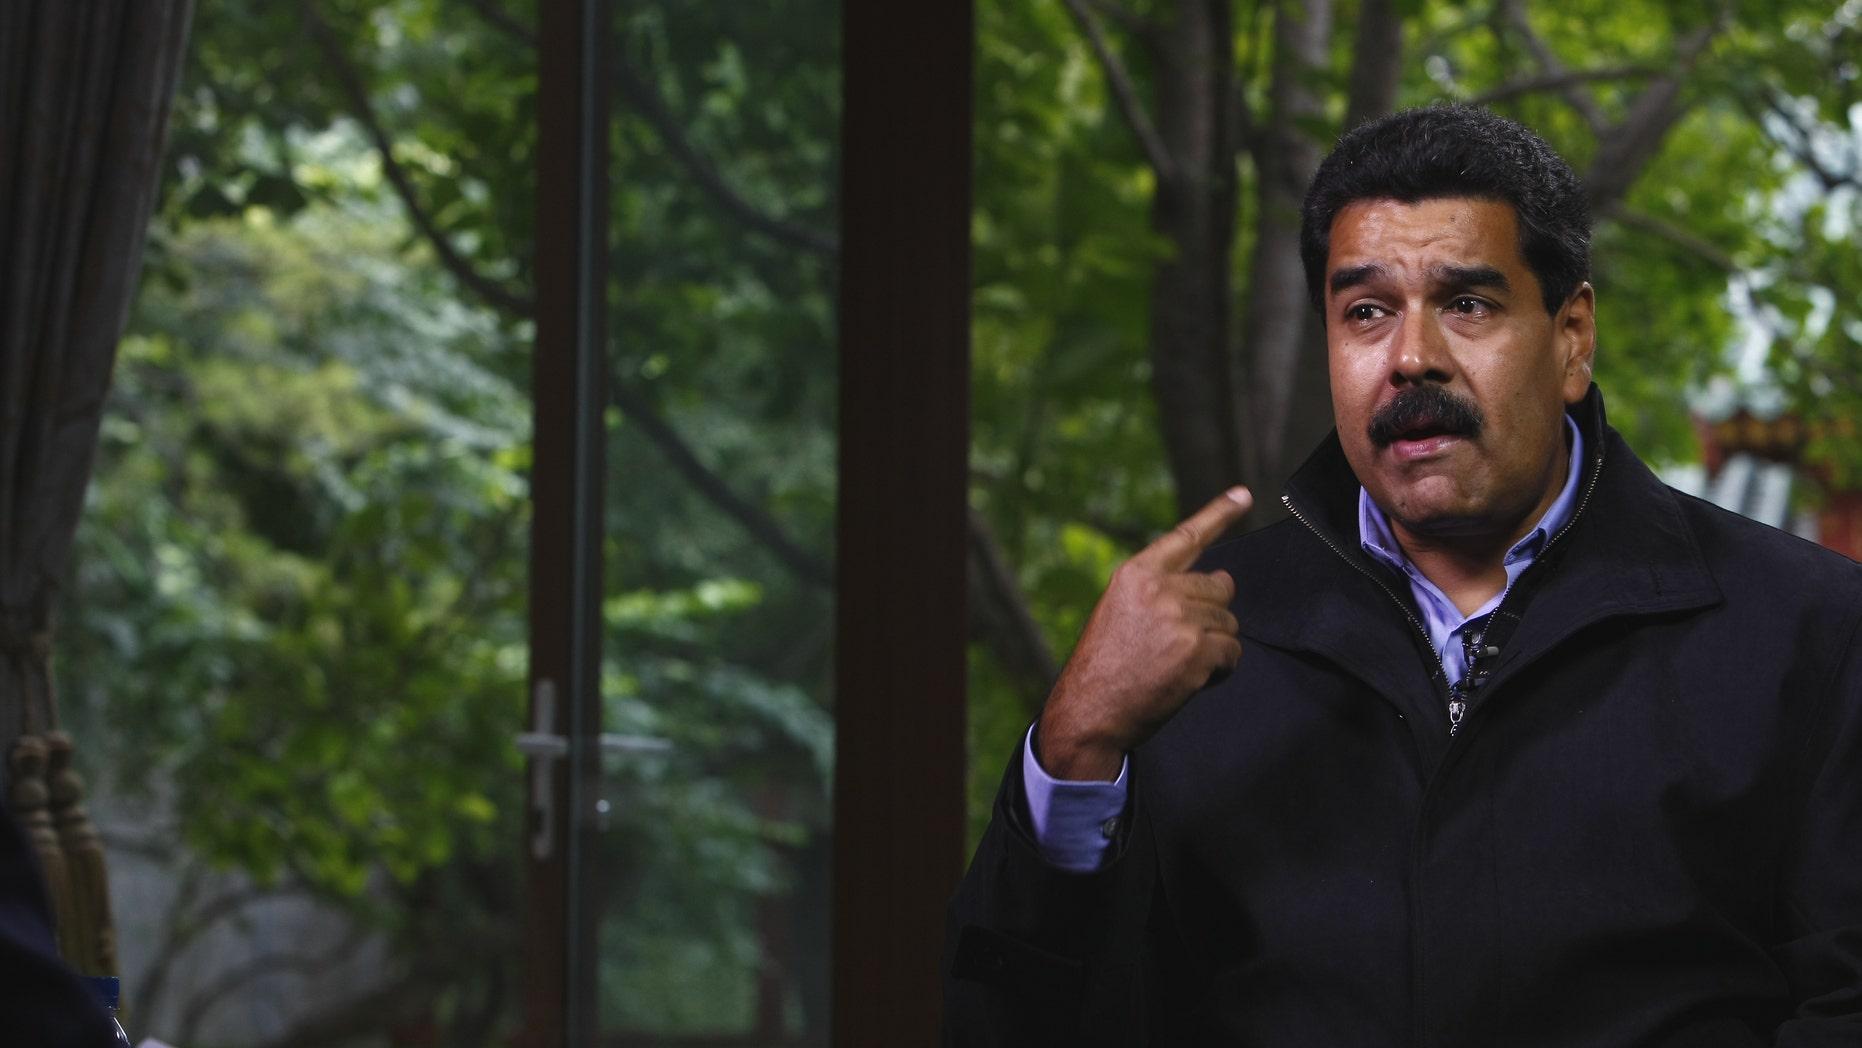 BEIJING, CHINA - SEPTEMBER 23:  (CHINA OUT) Venezuelan President Nicolas Maduro Moros is interviewed by Chinatoday, Chinadaily and CCTV at Diaoyutai State Guesthouse on September 23, 2013 in Beijing, China.  (Photo by ChinaFotoPress/Getty Images)